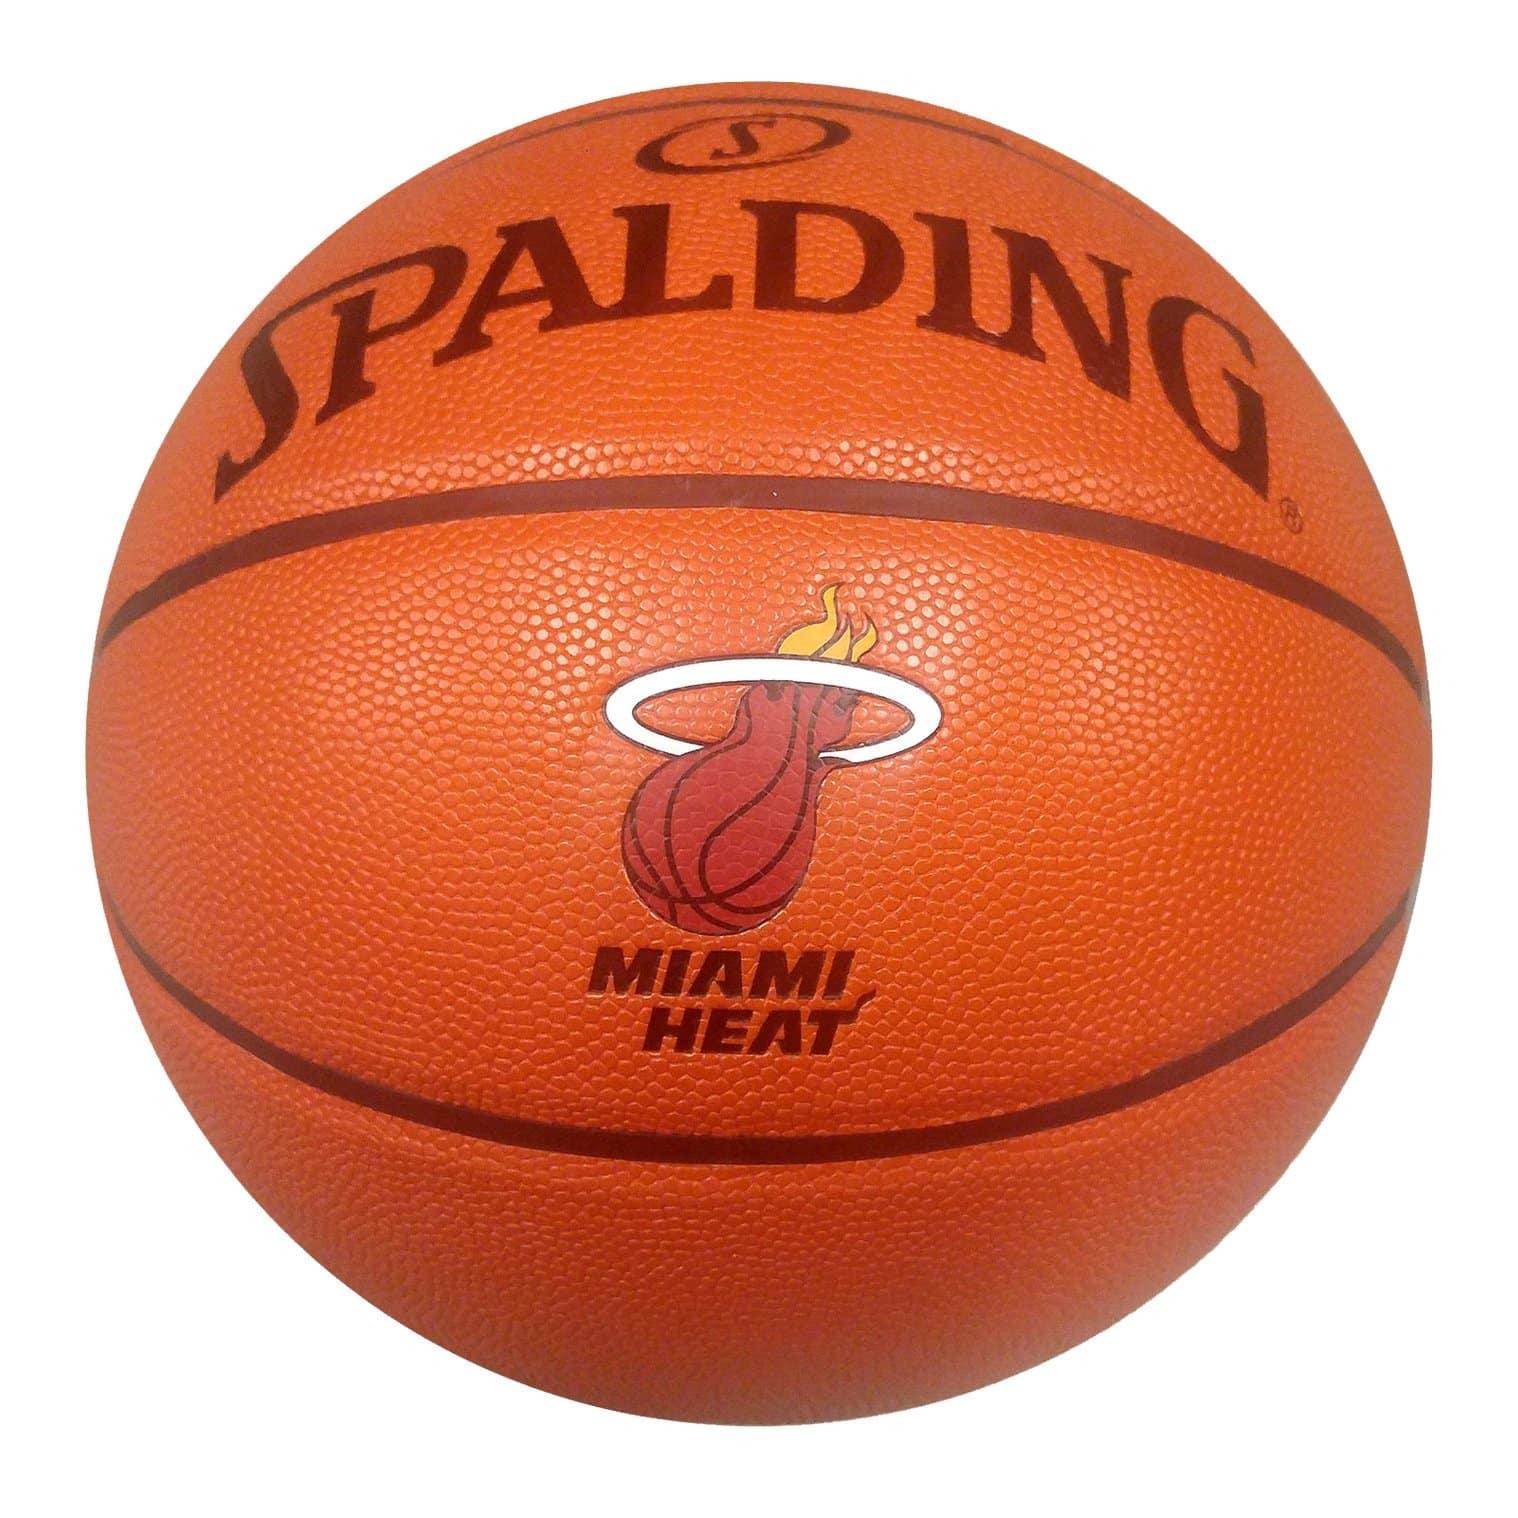 Spalding-Miami-Heat